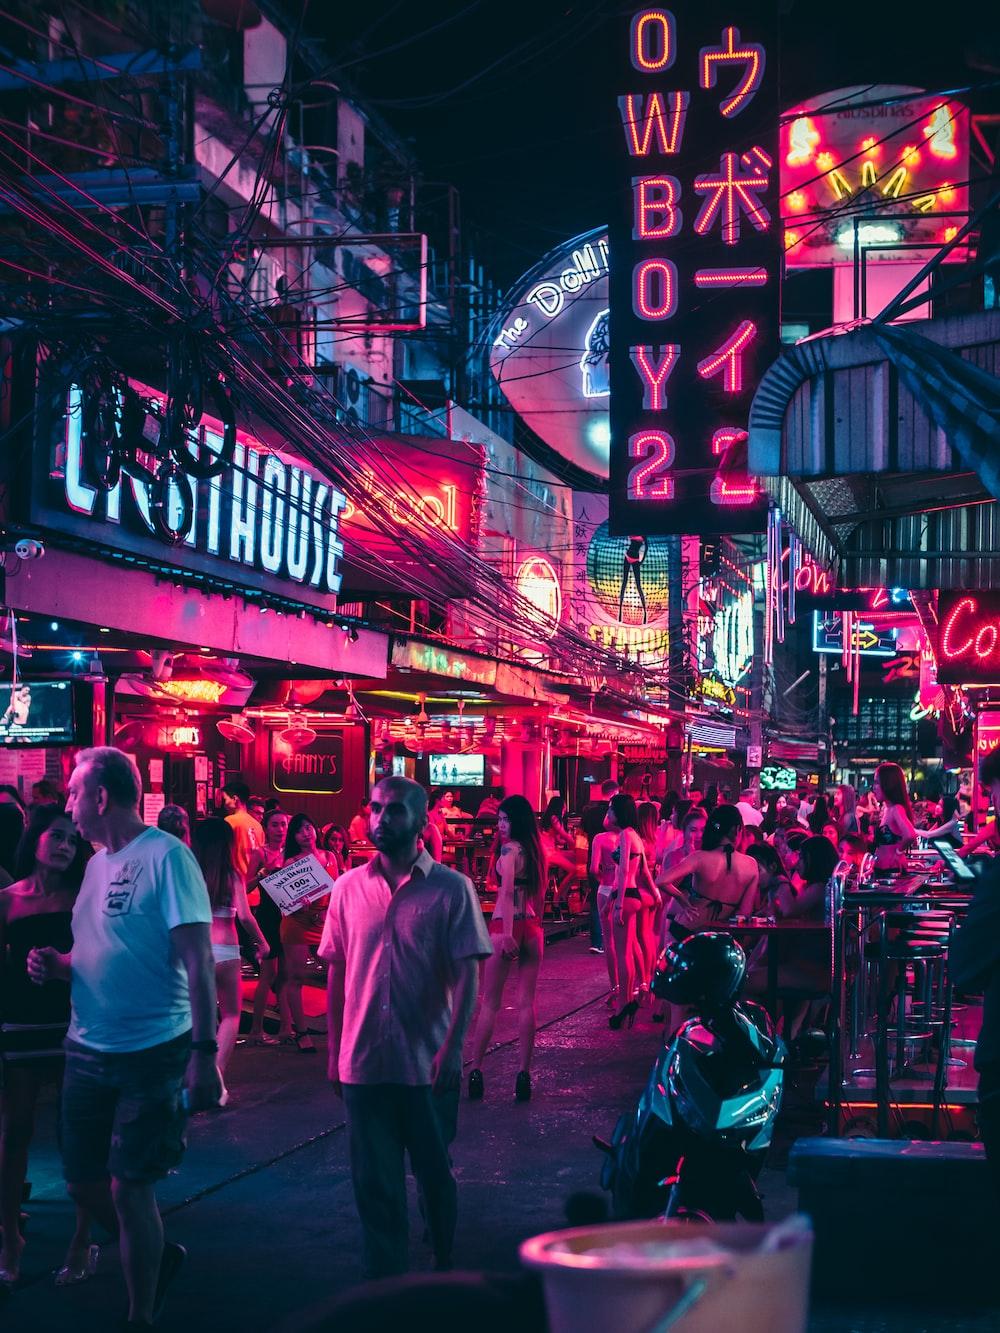 woman wearing bikinis in alley during night time